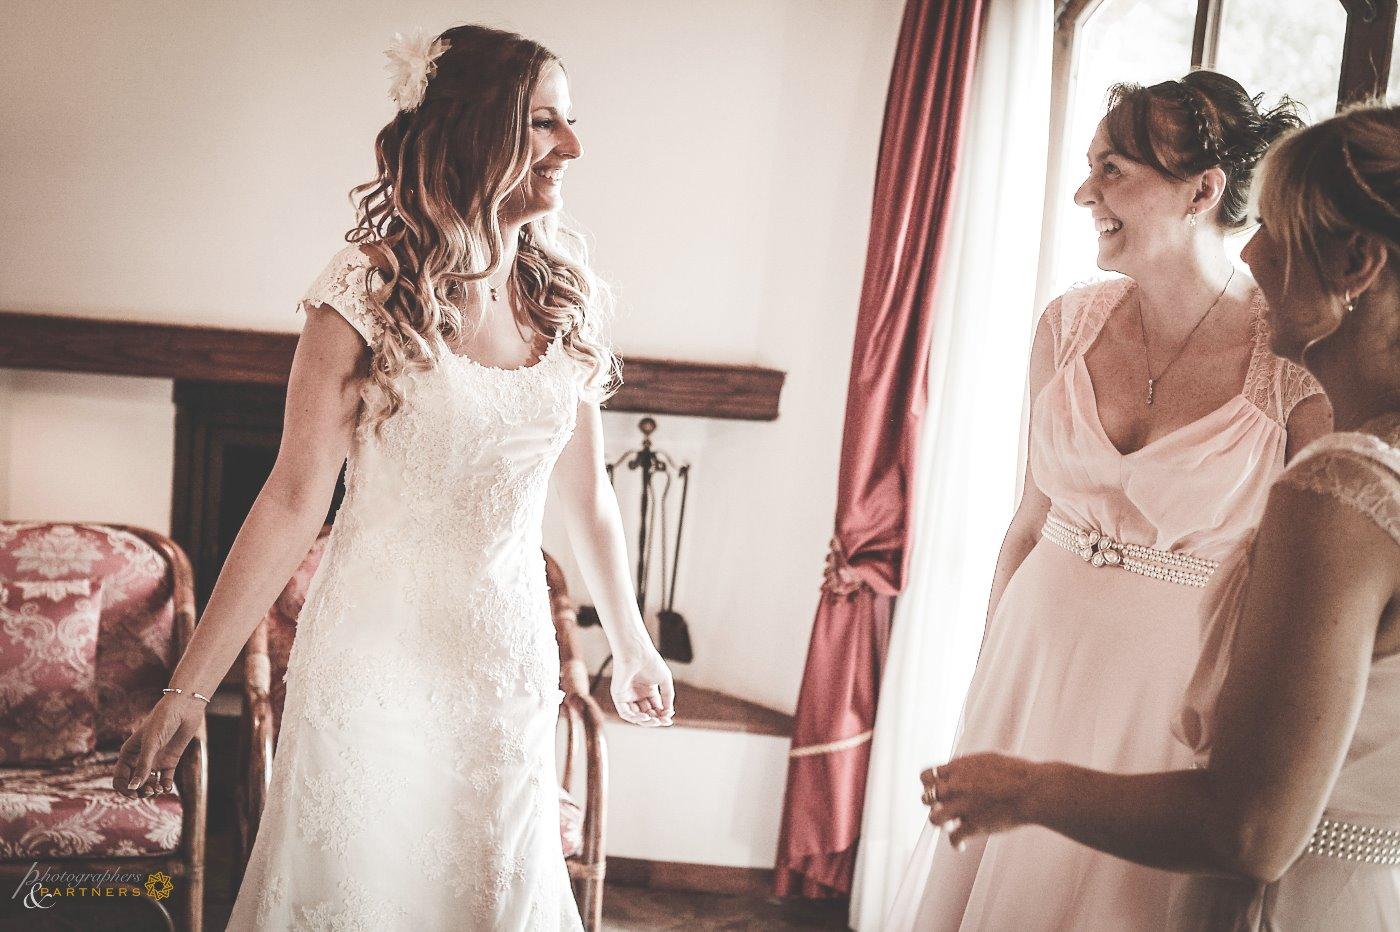 photography_weddings_scarlino_02.jpg